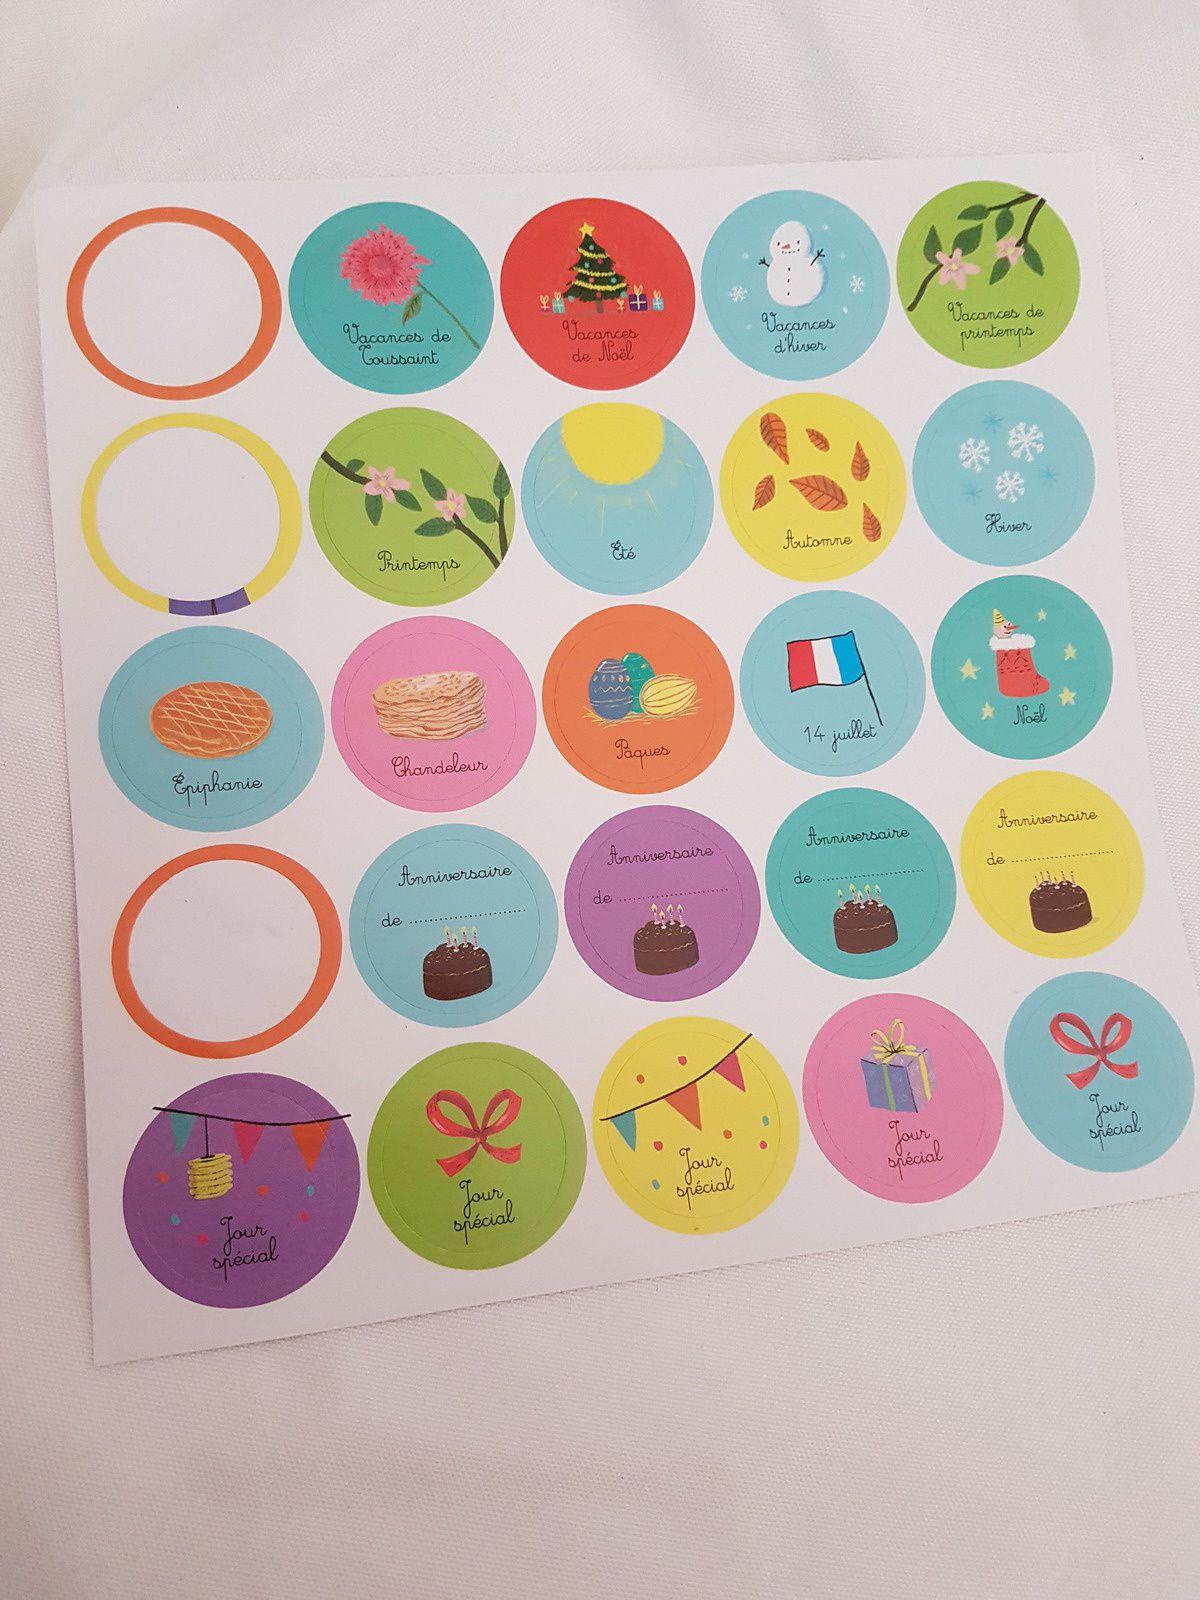 Ma Frise Du Temps Montessori : frise, temps, montessori, Frise, Temps, Montessori, Gründ, Chouille, Cuisine, Bricole